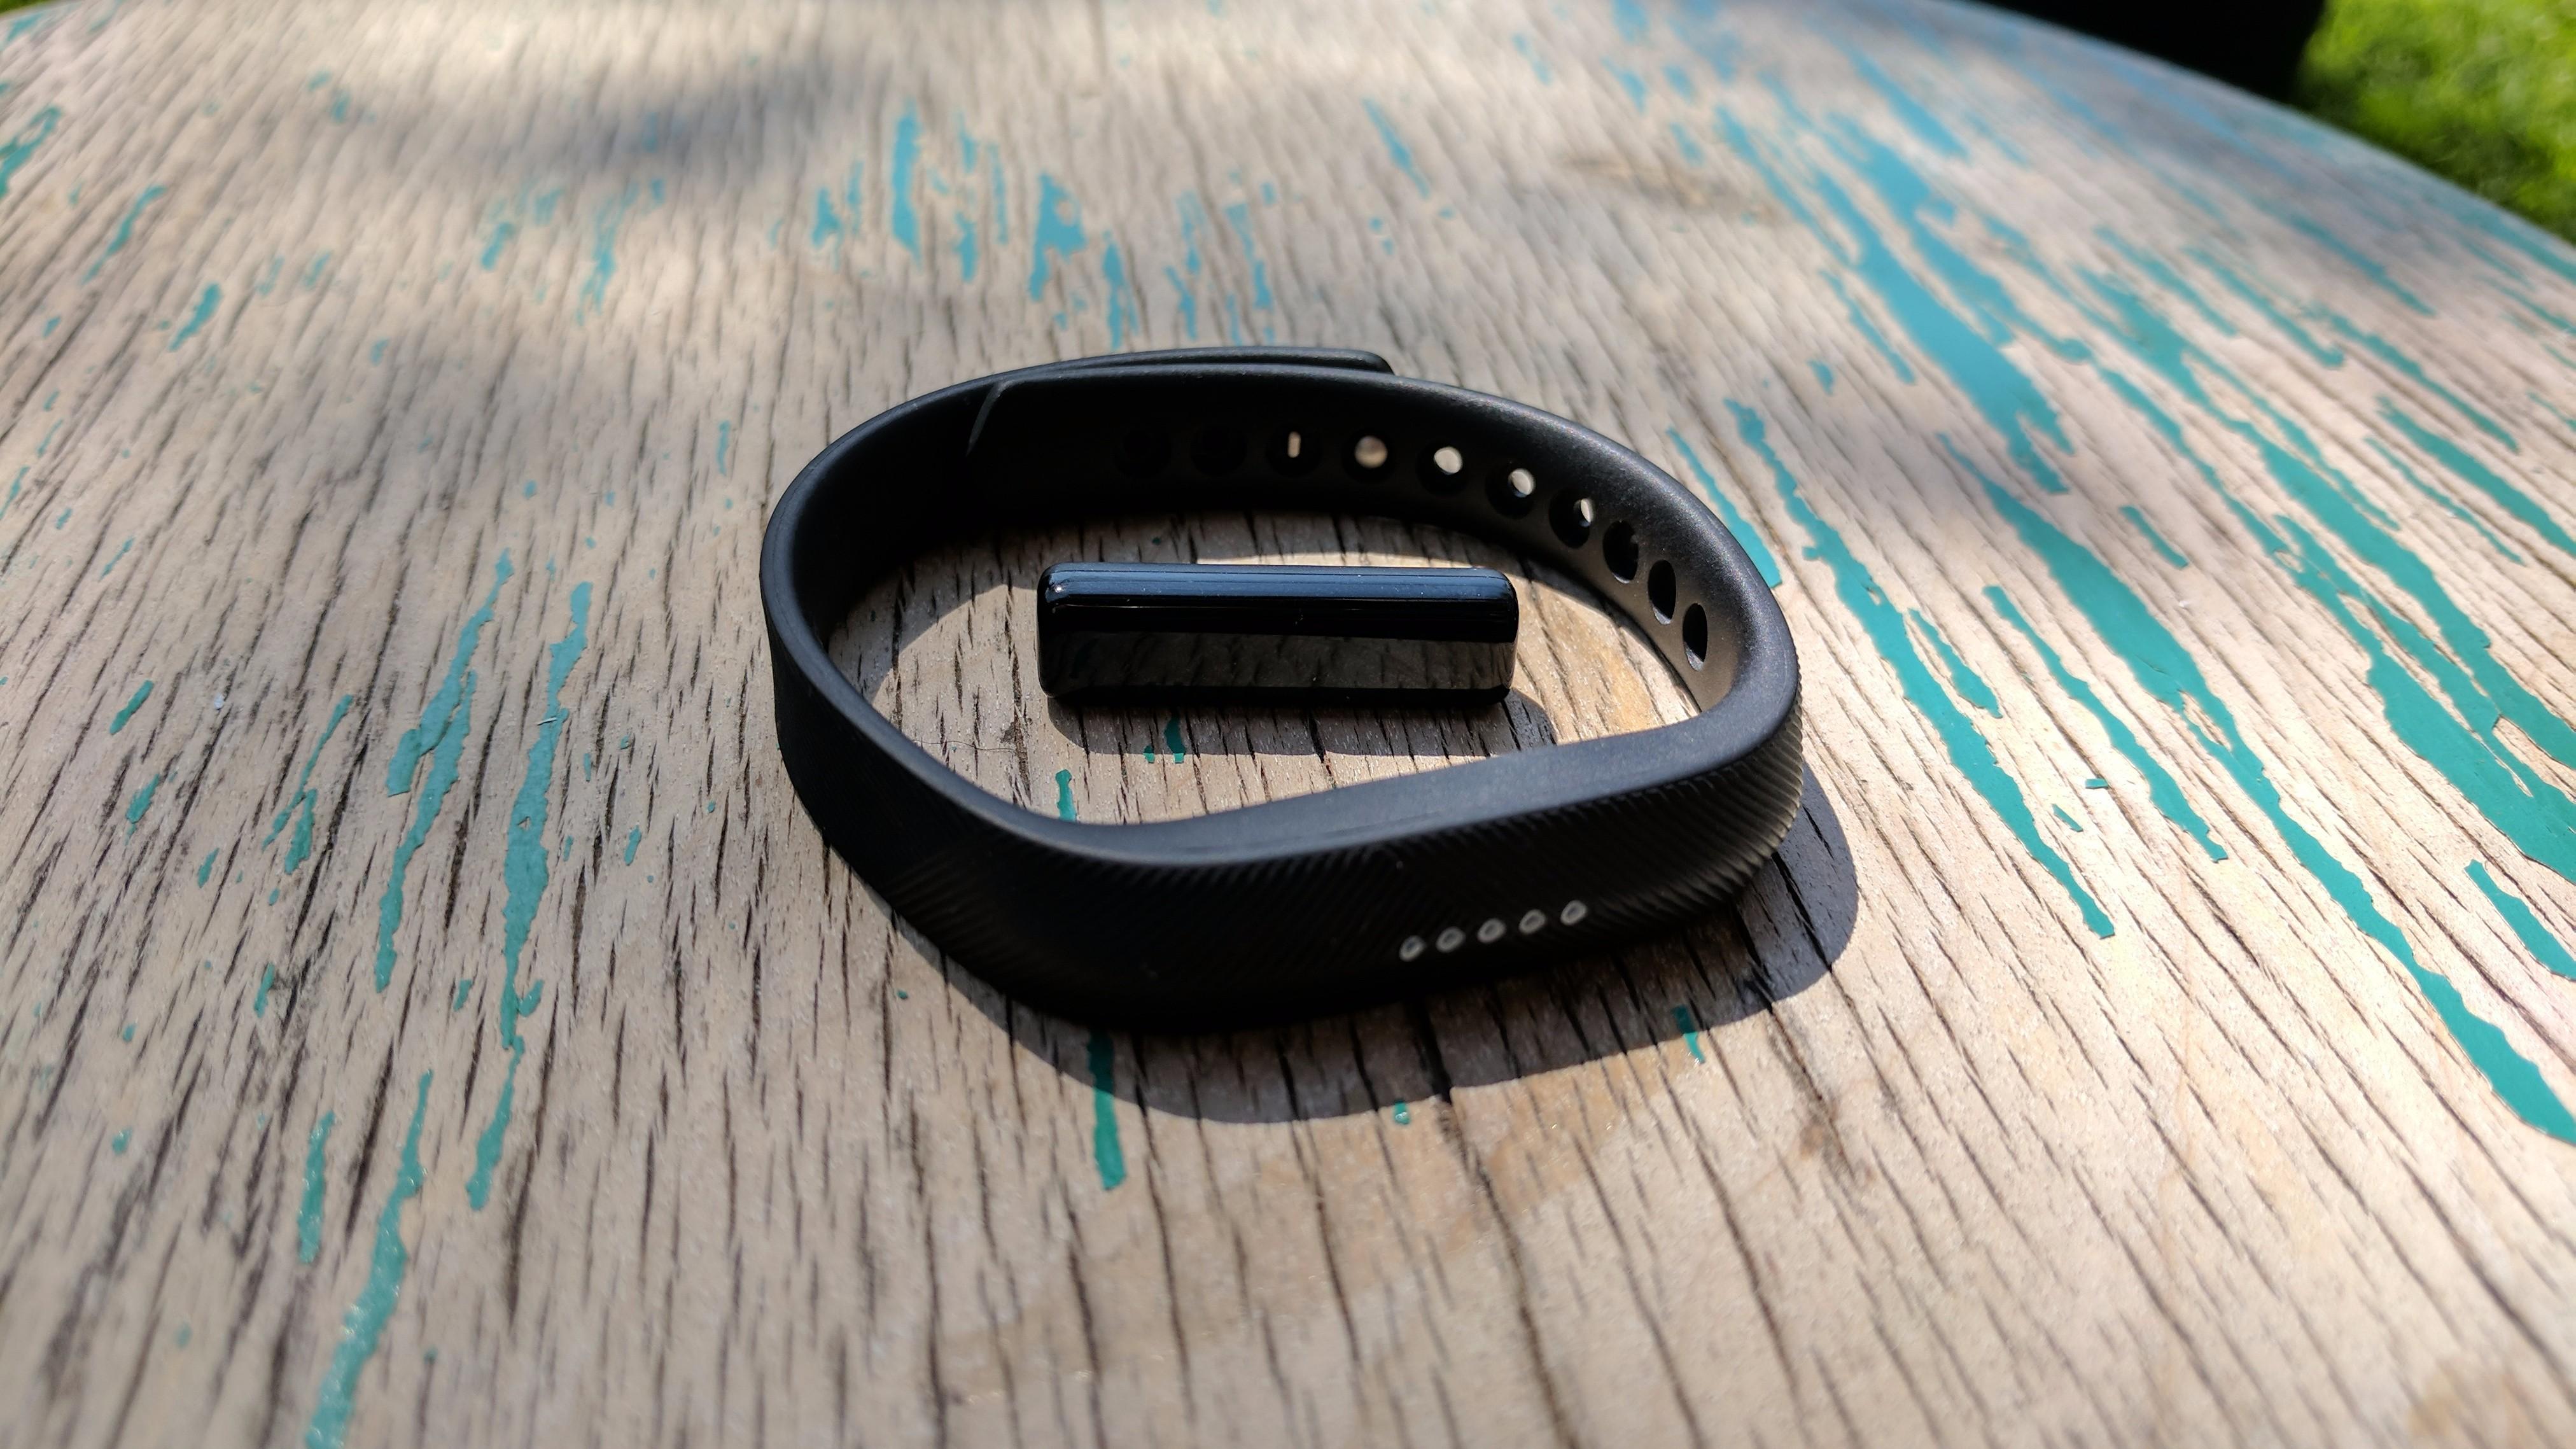 c08b9c5fbe2c Review Fitbit Flex 2